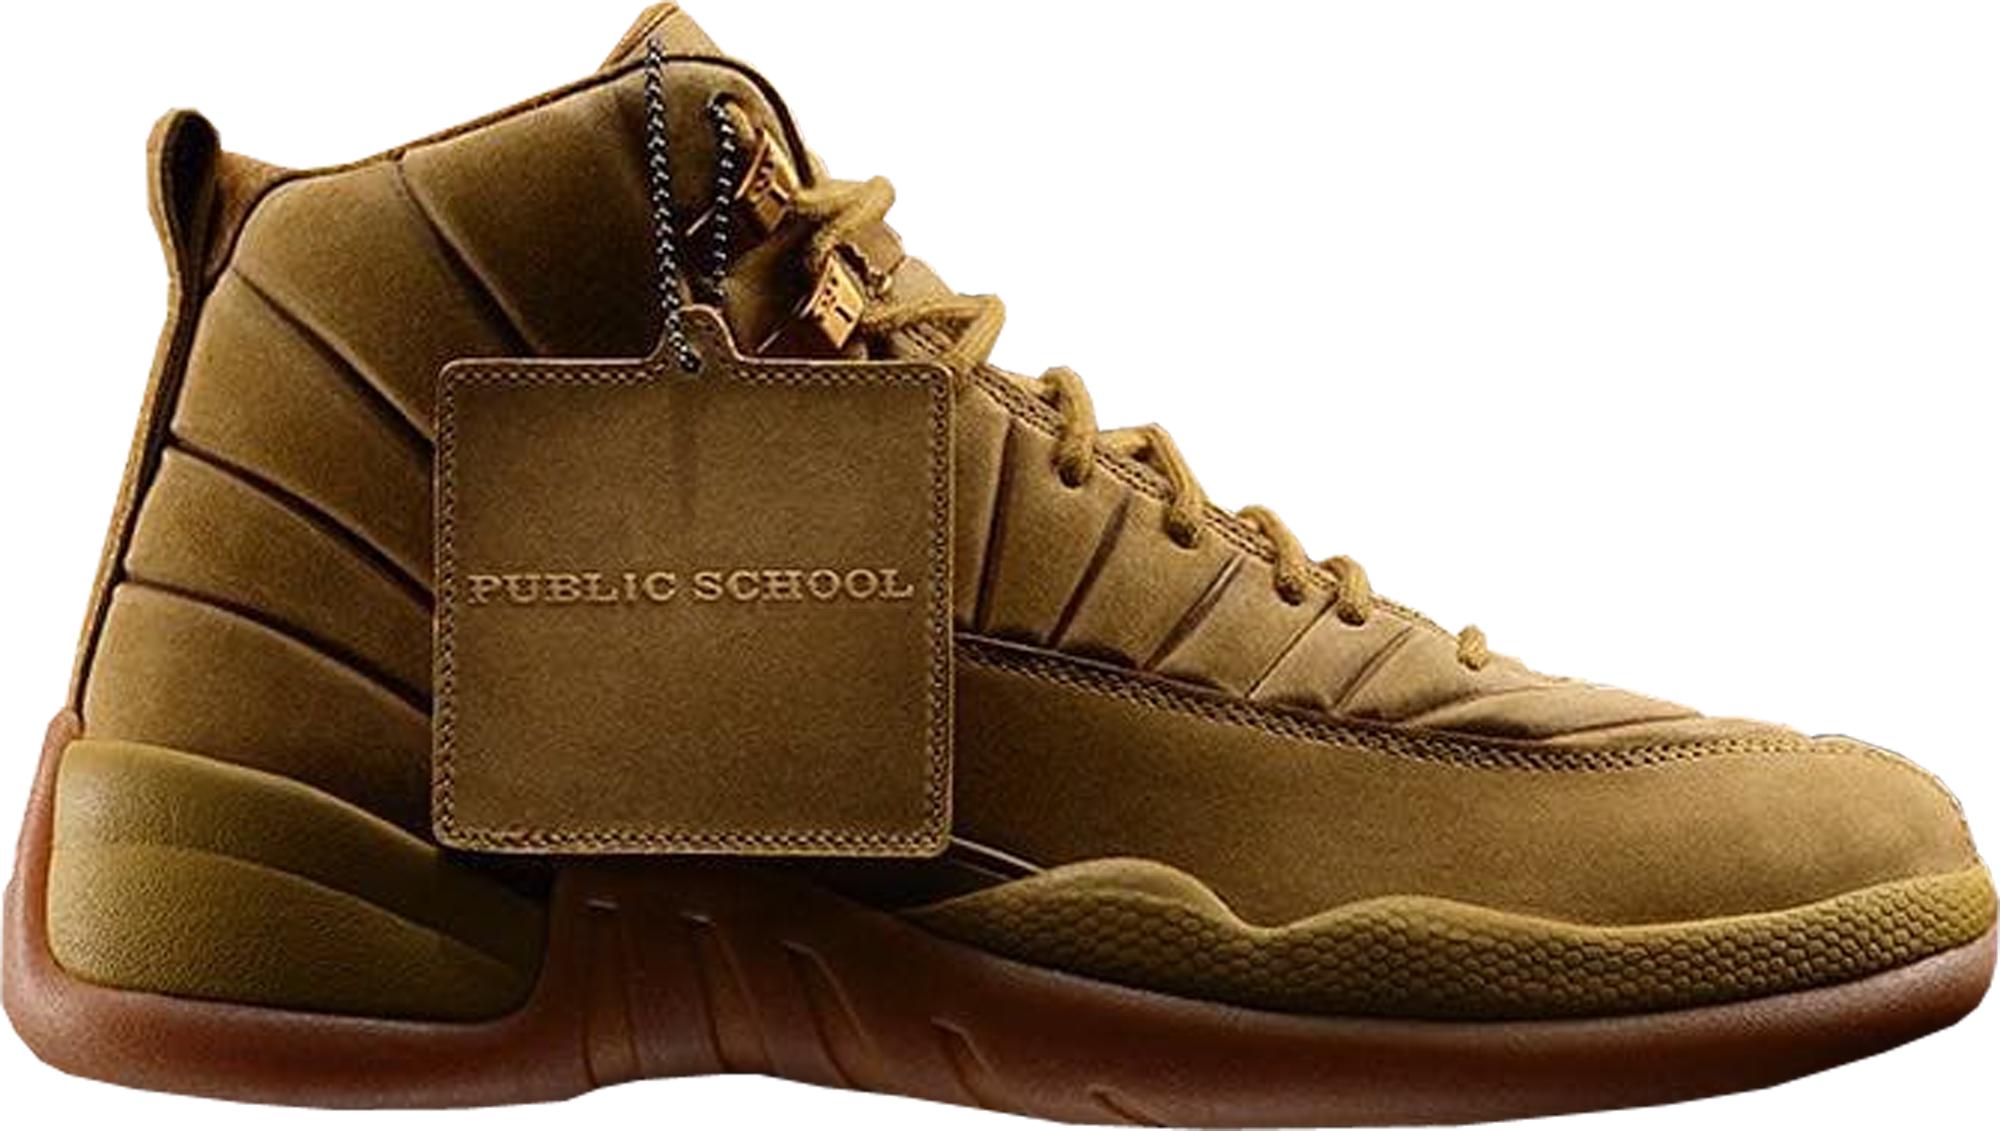 36bdfa81e6efcd Public School x Air Jordan 12 Retro PSNY Wheat - StockX News